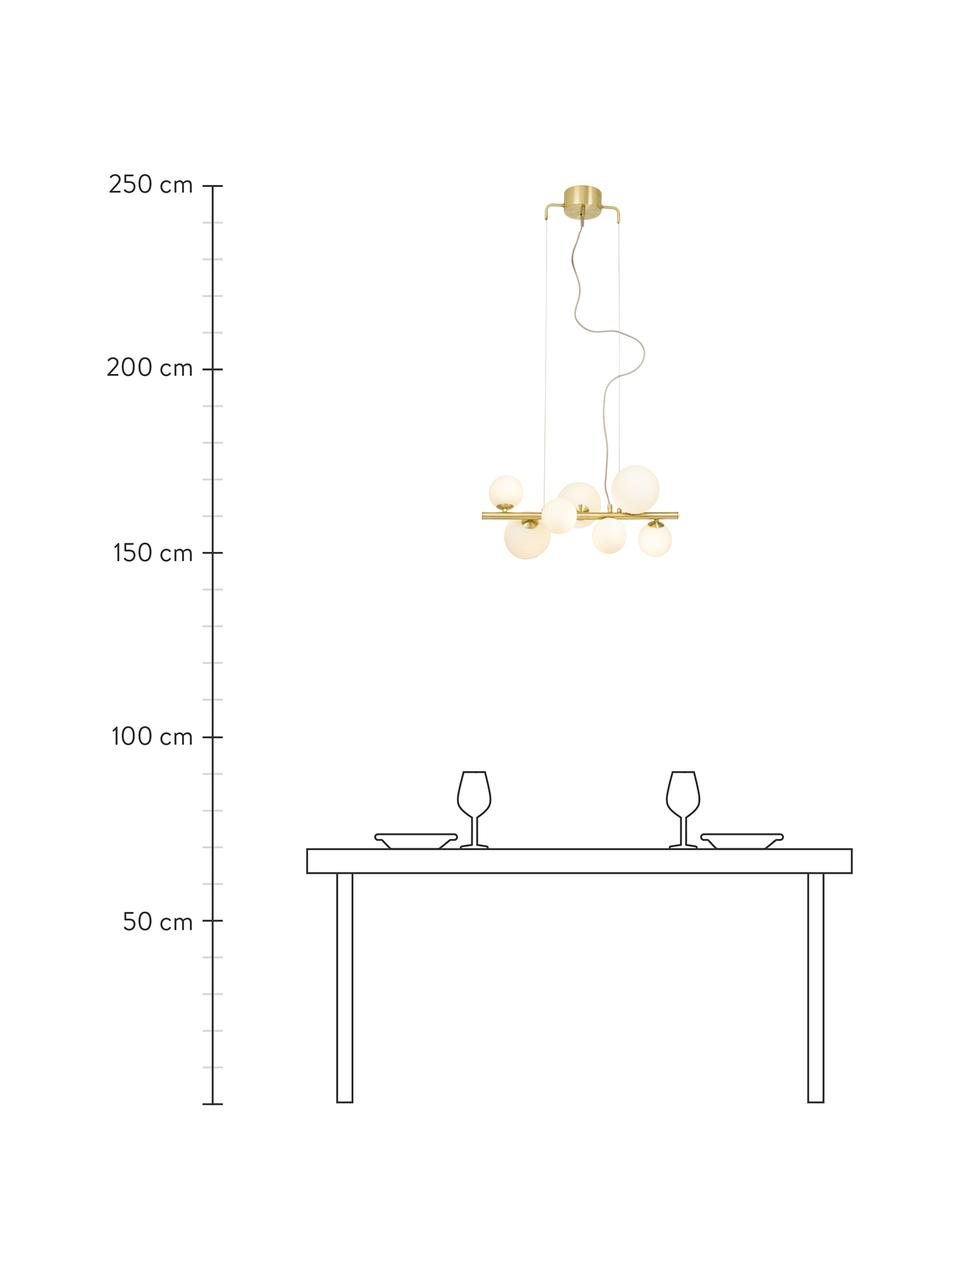 Pendelleuchte Molekyl aus Opalglas, Baldachin: Metall, beschichtet, Goldfarben, Weiß, 58 x 26 cm